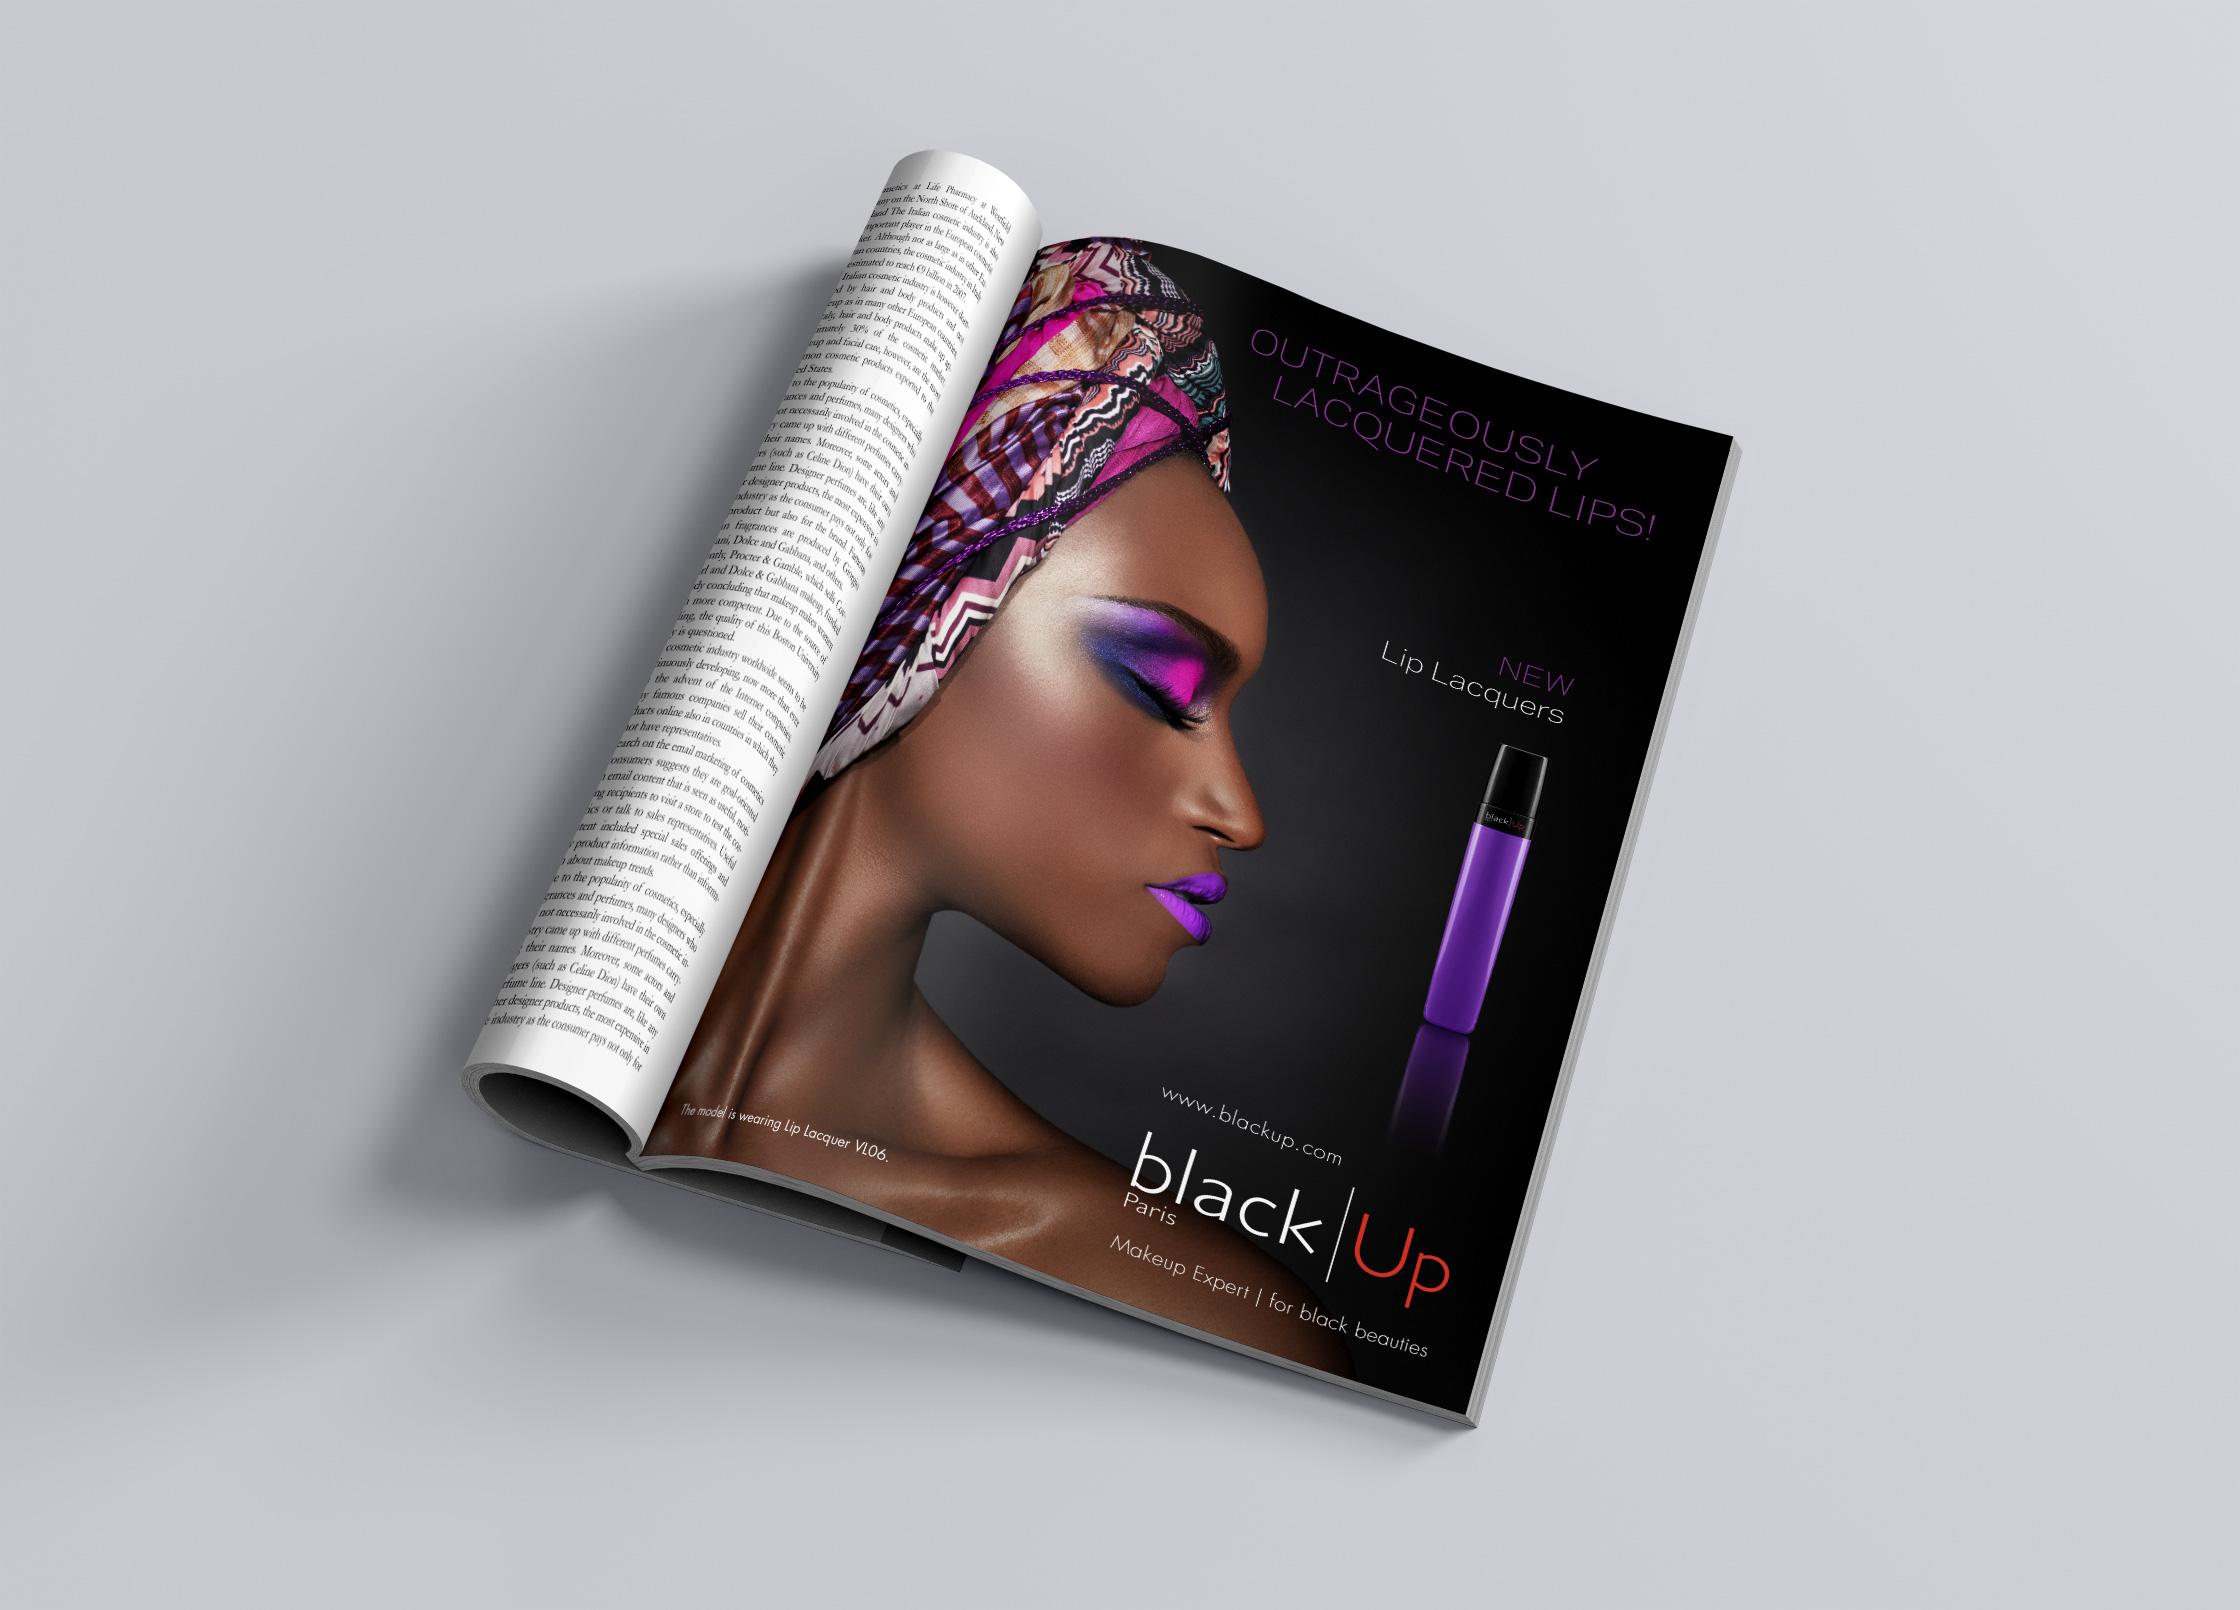 black_up_double_lip_lacquers